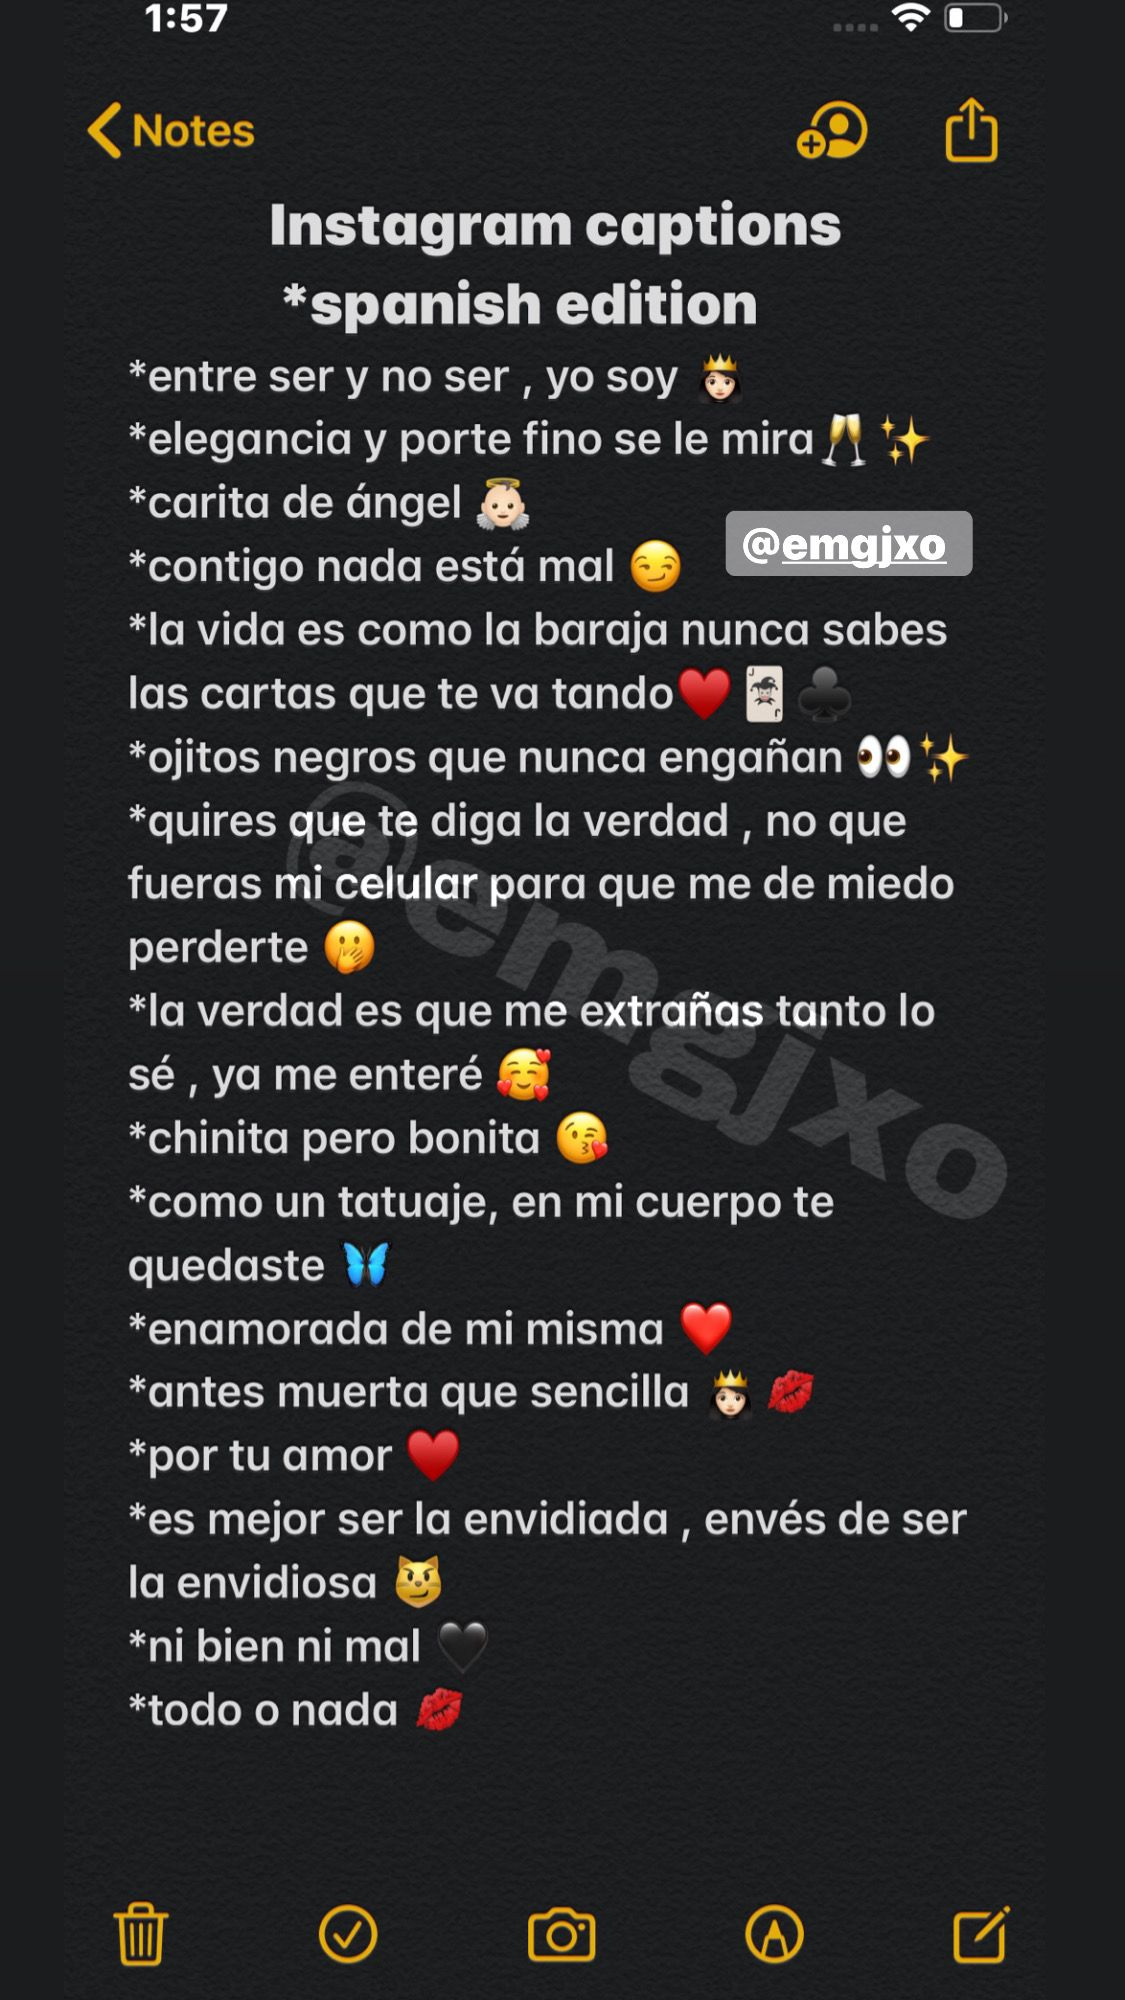 Good Spanish Captions : spanish, captions, Instagram, Captions, *spanish, Edition, Short, Captions,, Witty